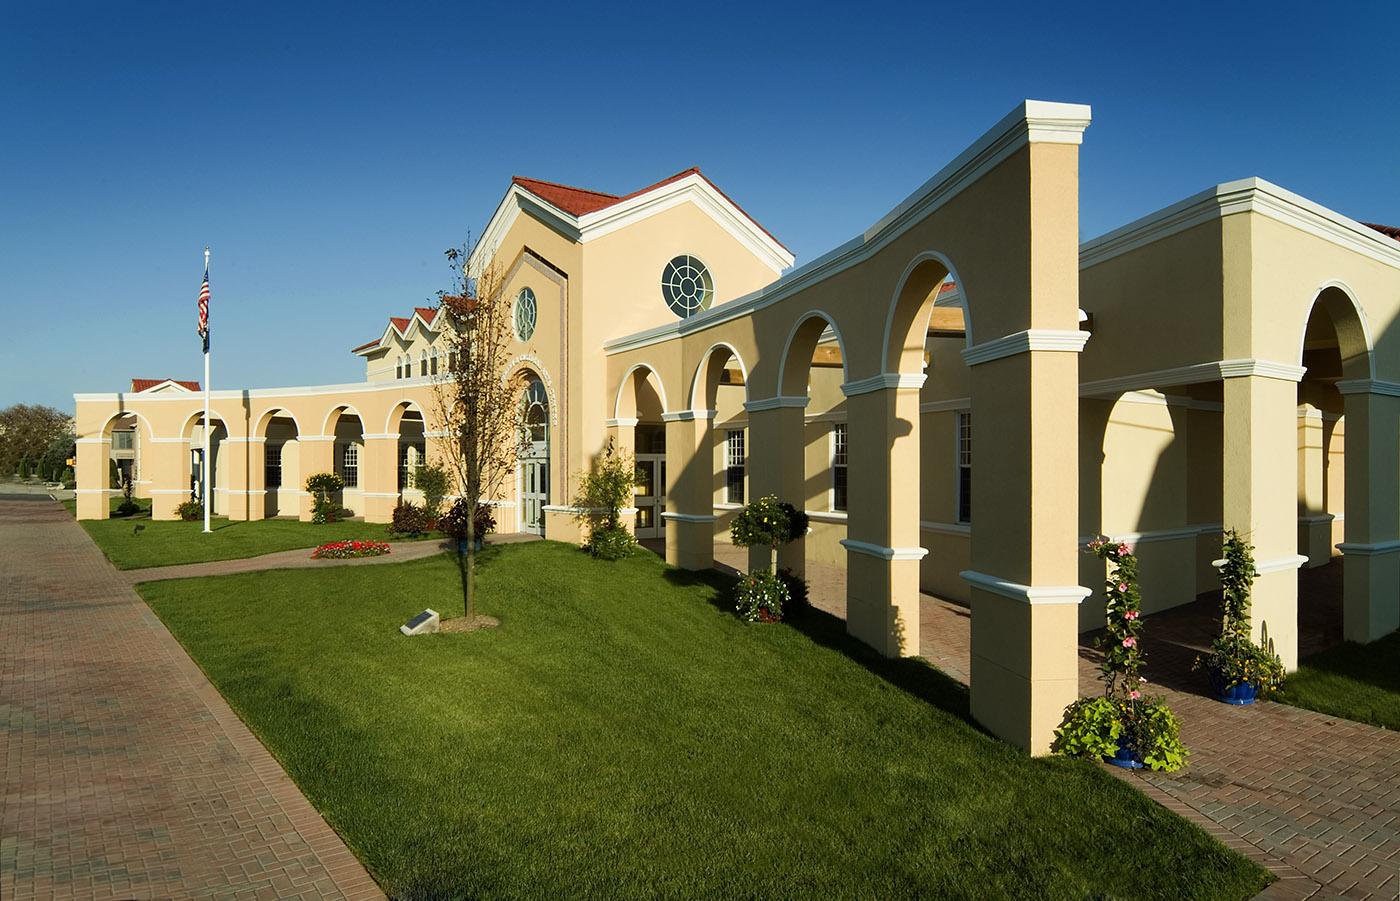 Ventnor Library & Cultural Arts Center exterior